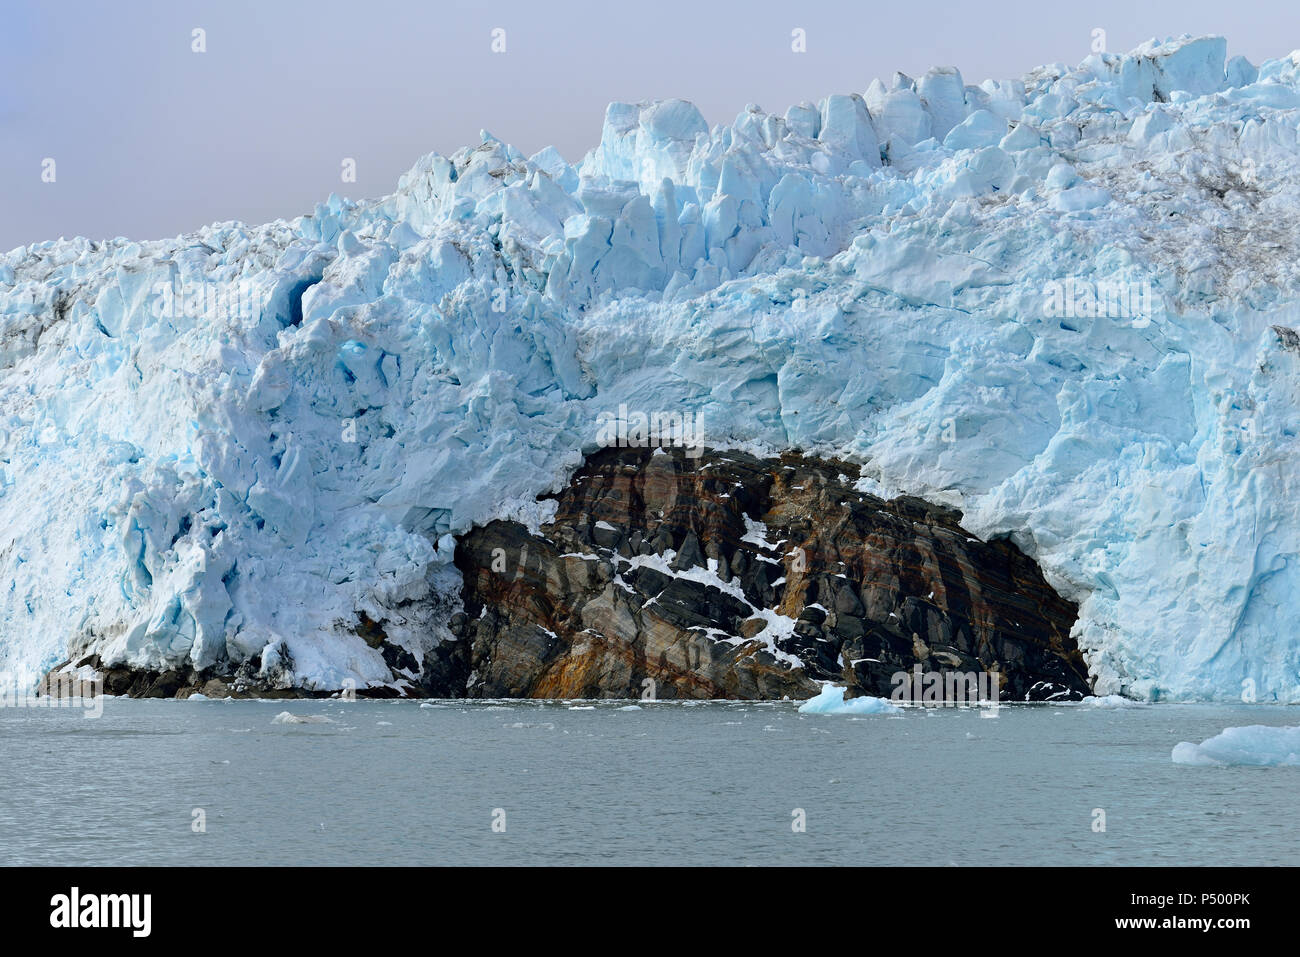 Greenland, East Greenland, Knud Rasmussen Glacier Stock Photo